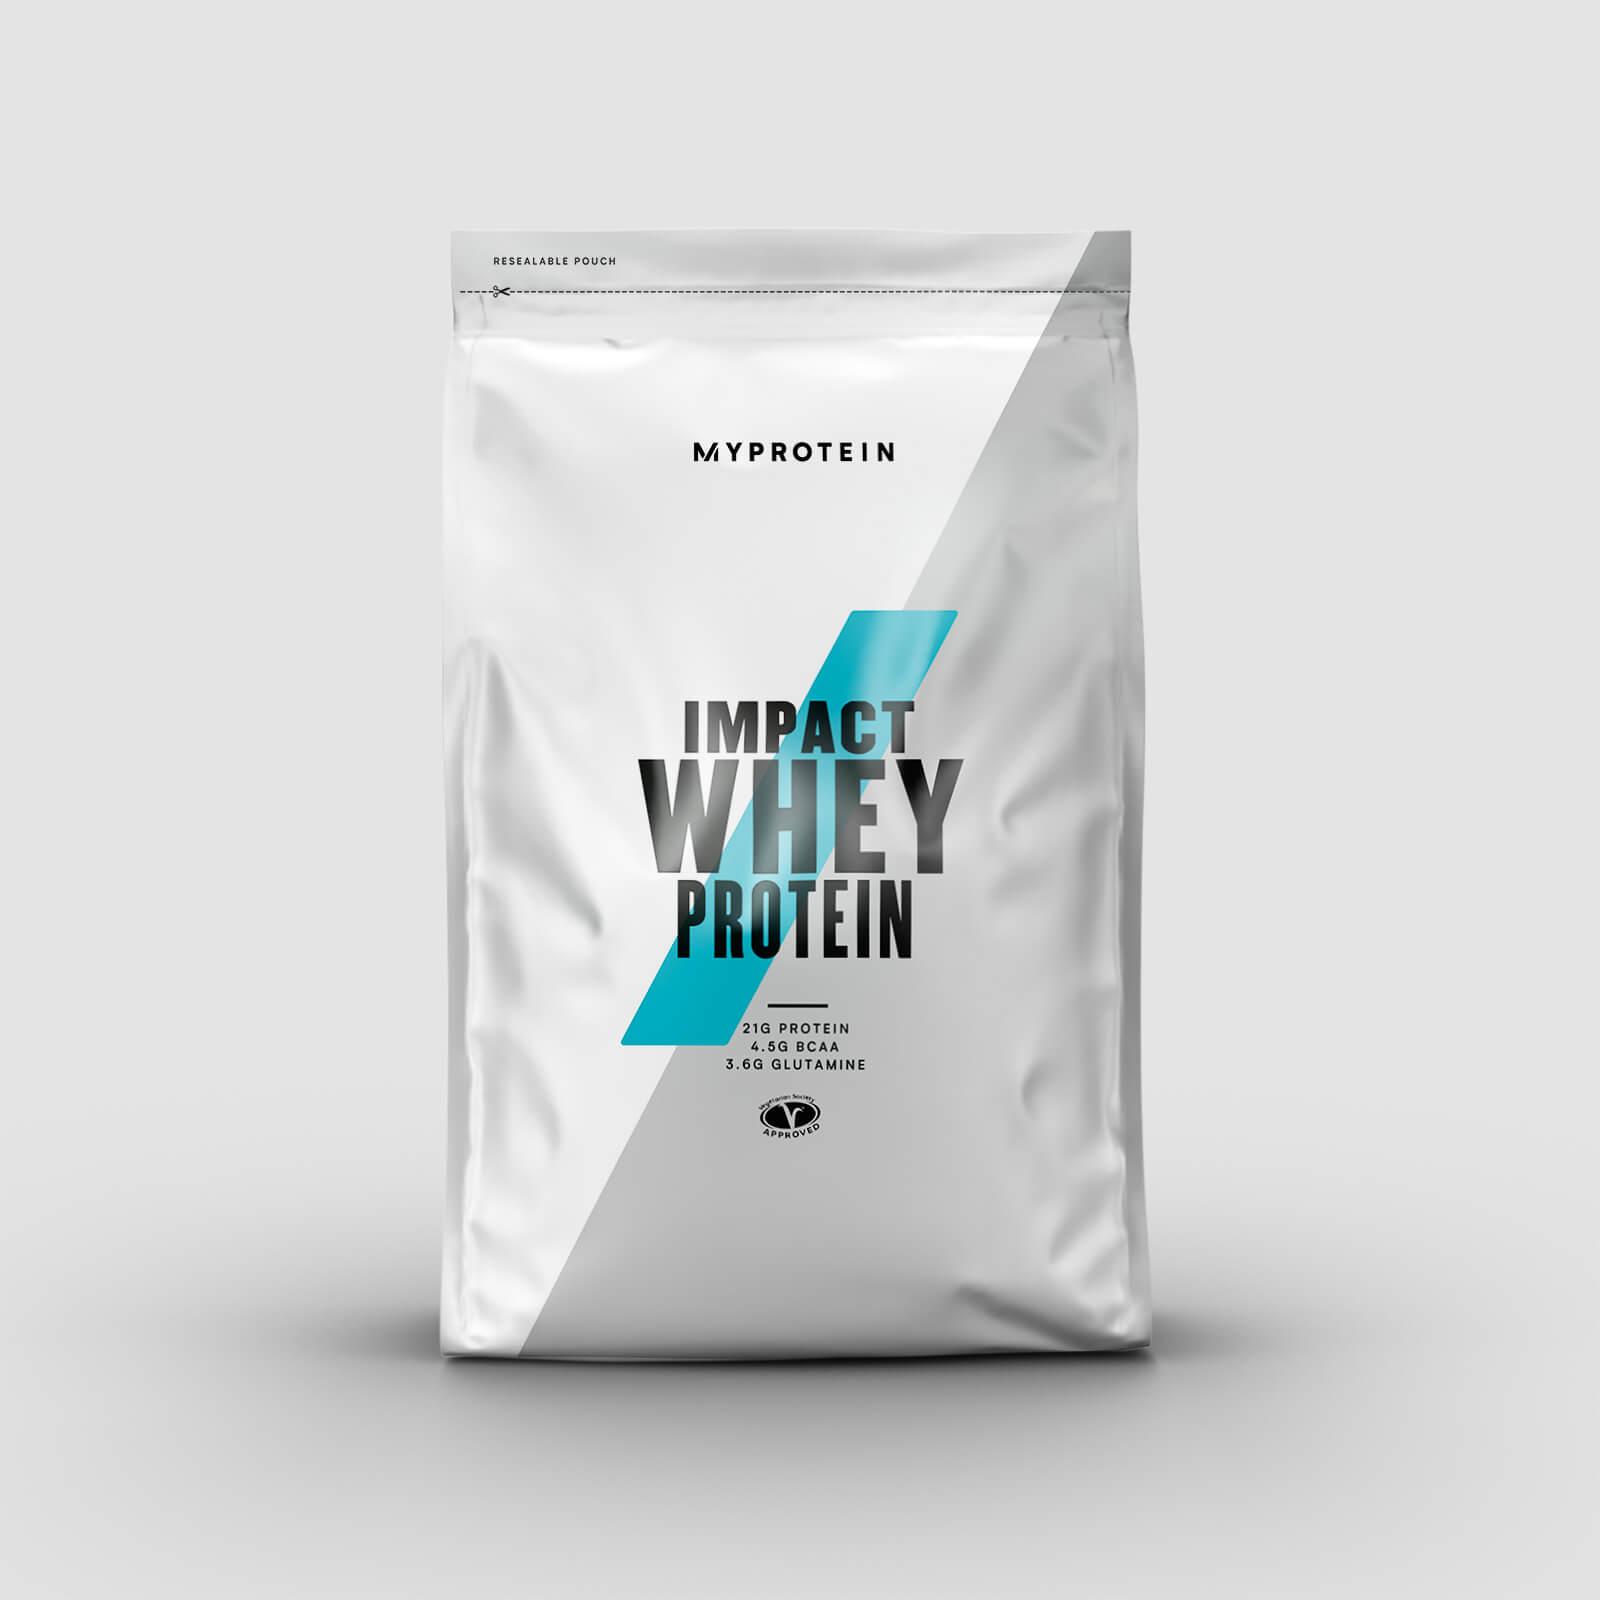 Myprotein Impact Whey Protein - 1kg - Cookies et crème